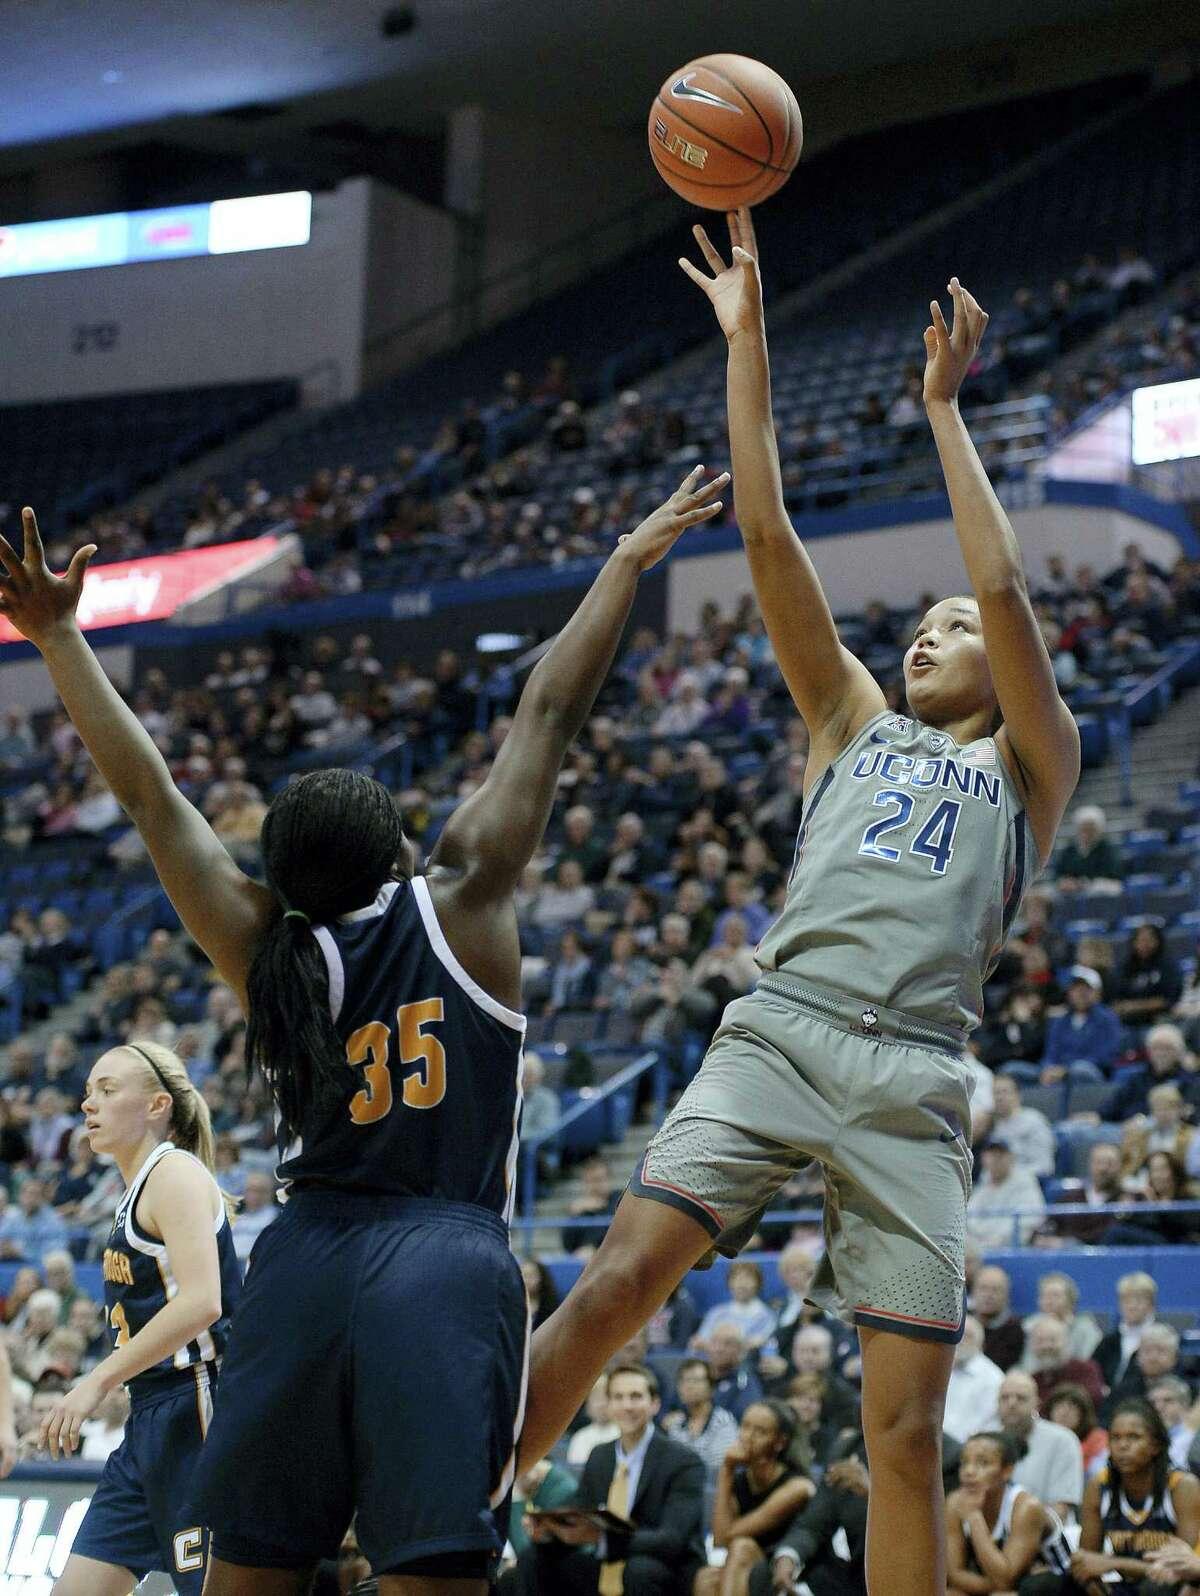 UConn's Napheesa Collier, right, shoots over Chattanooga's Aryanna Gilbert.